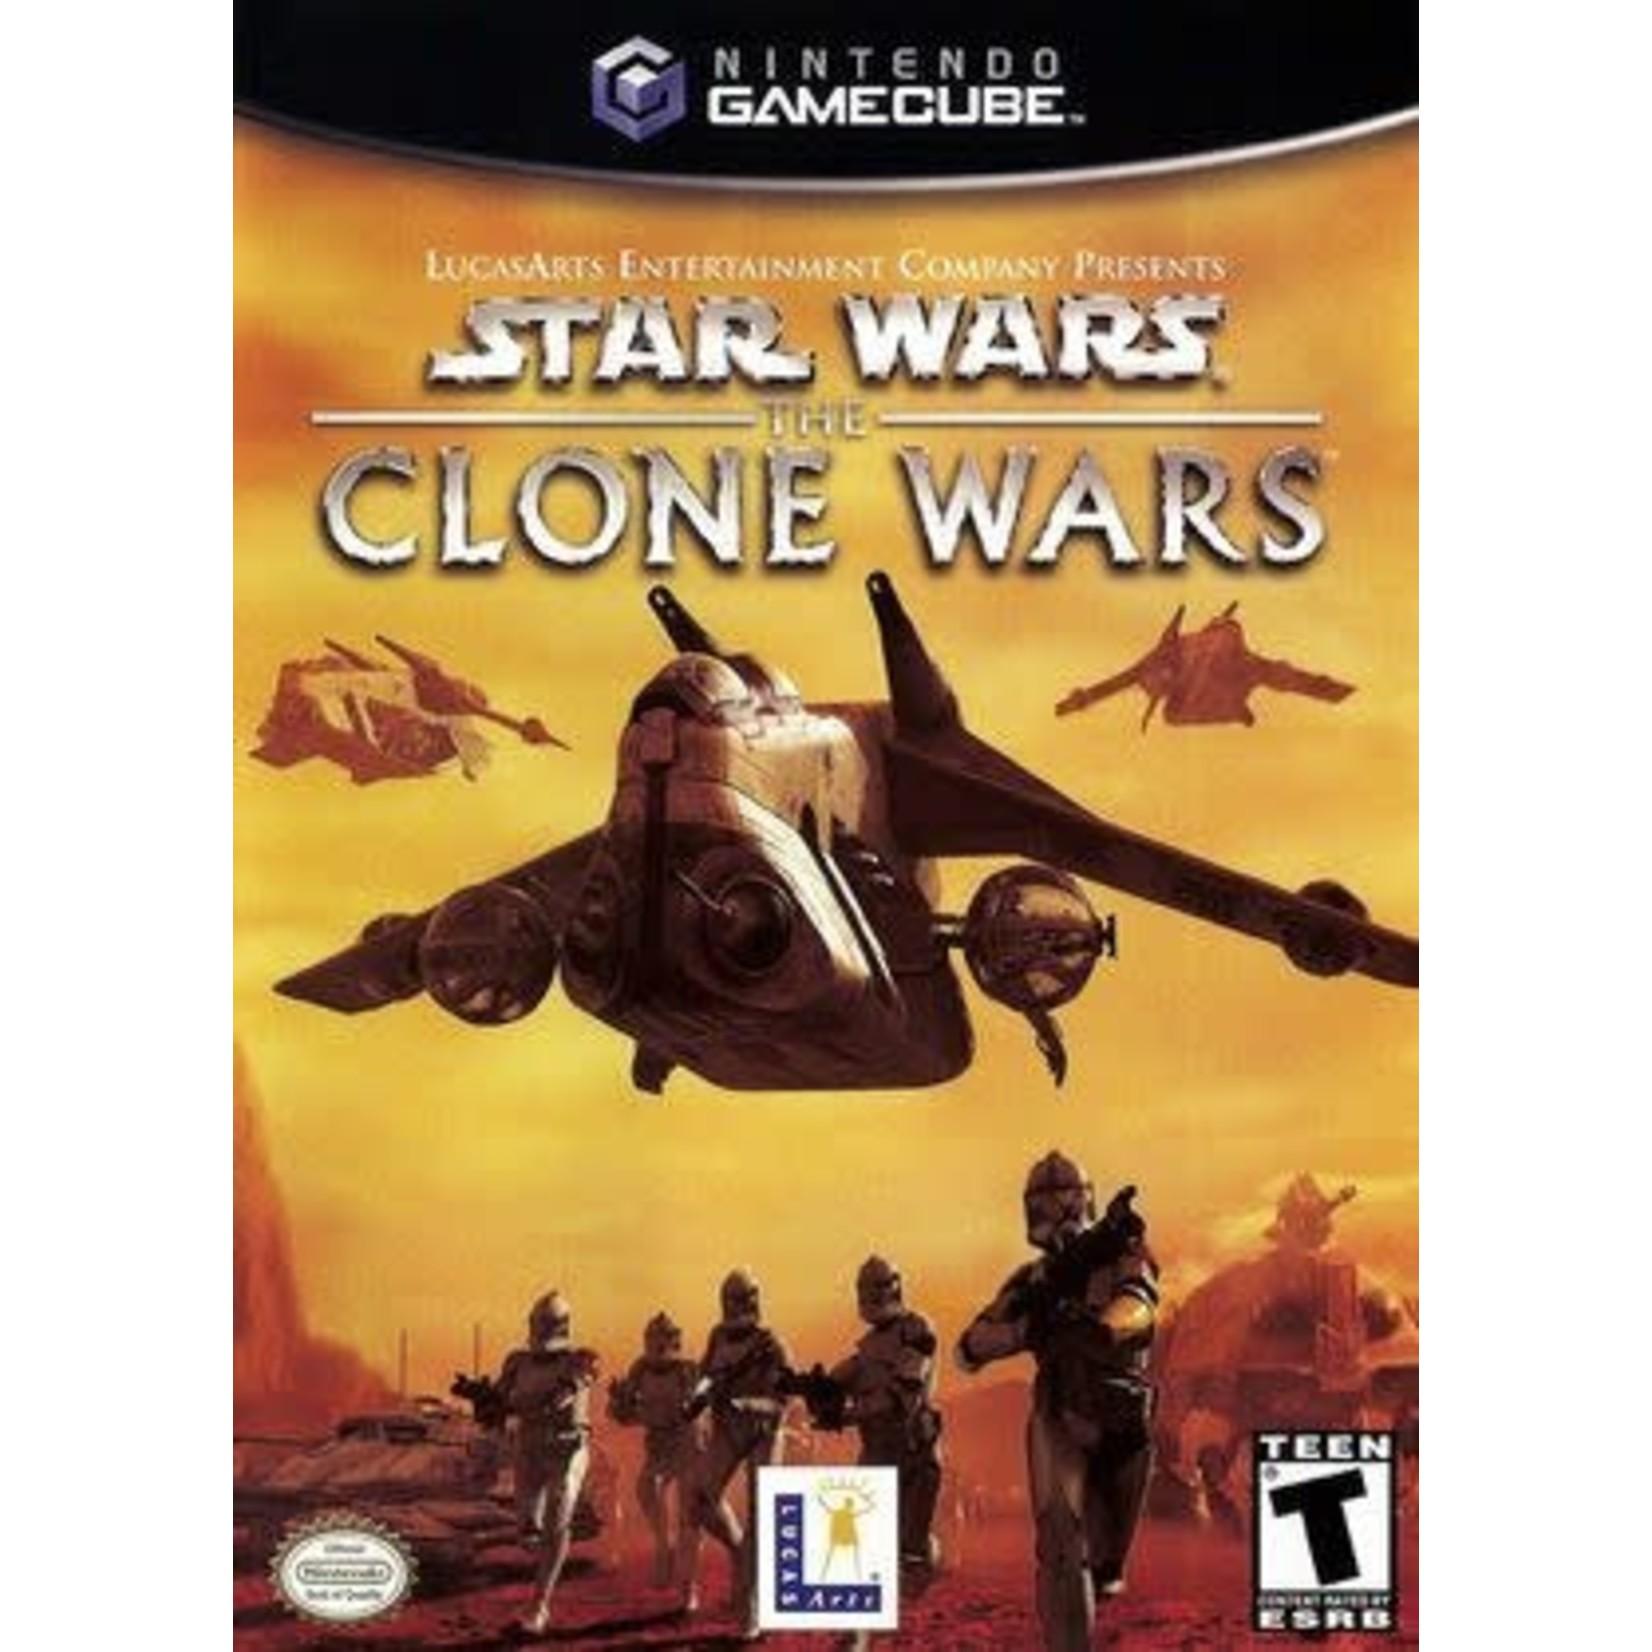 GCU-Star Wars Clone Wars